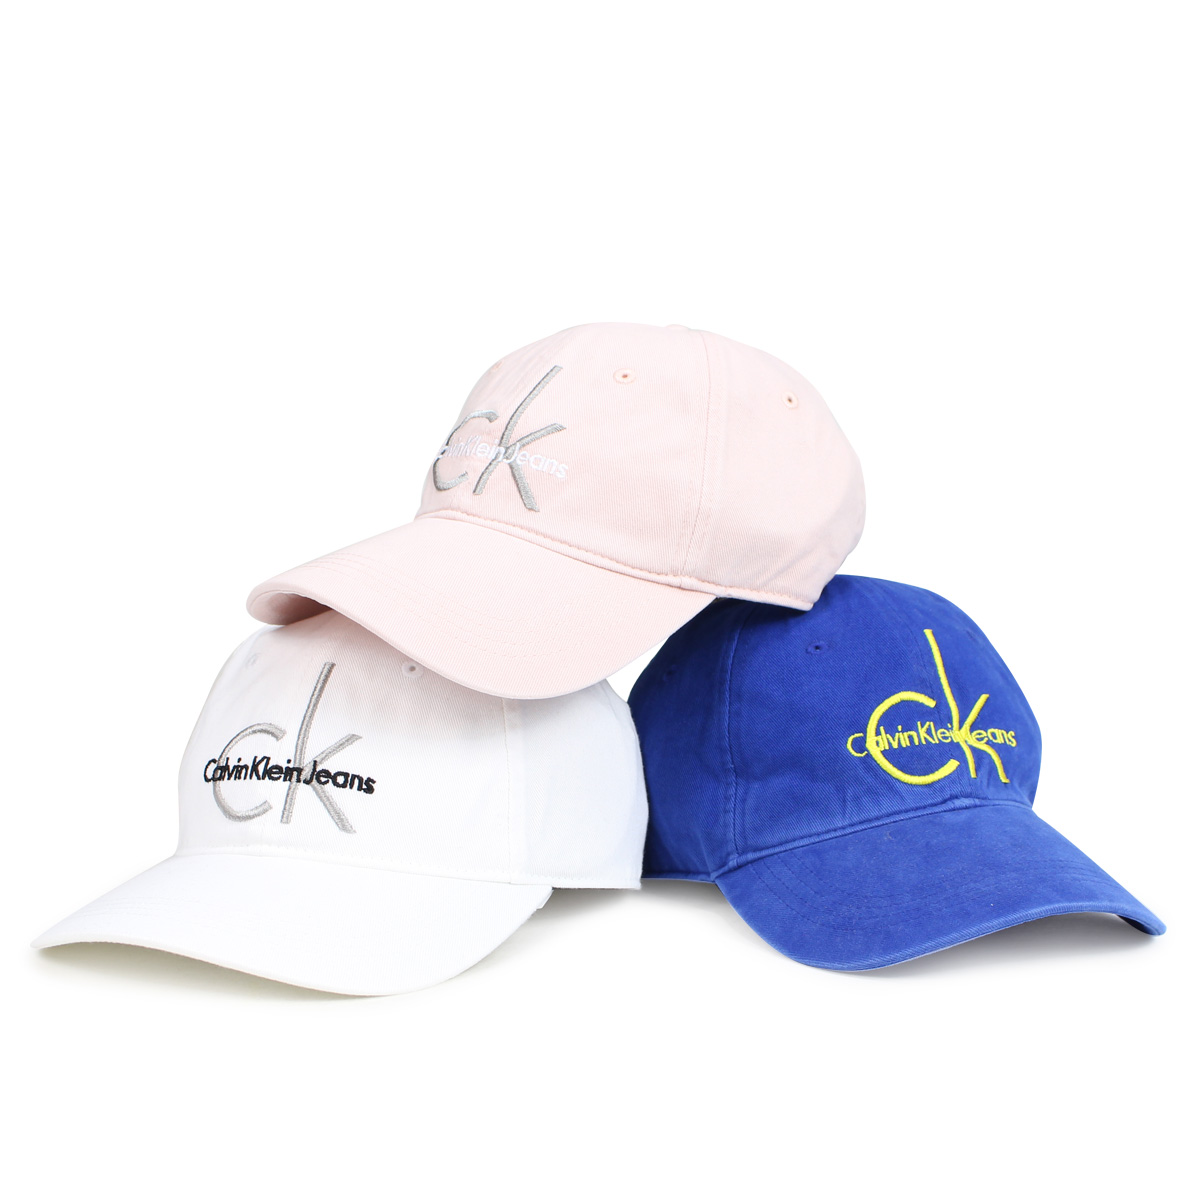 6281b5a097b Calvin Klein Jeans EMBROIDERED HERITAGE LOGO Calvin Klein jeans cap hat men  gap Dis CAP white pink  7 13 Shinnyu load   187